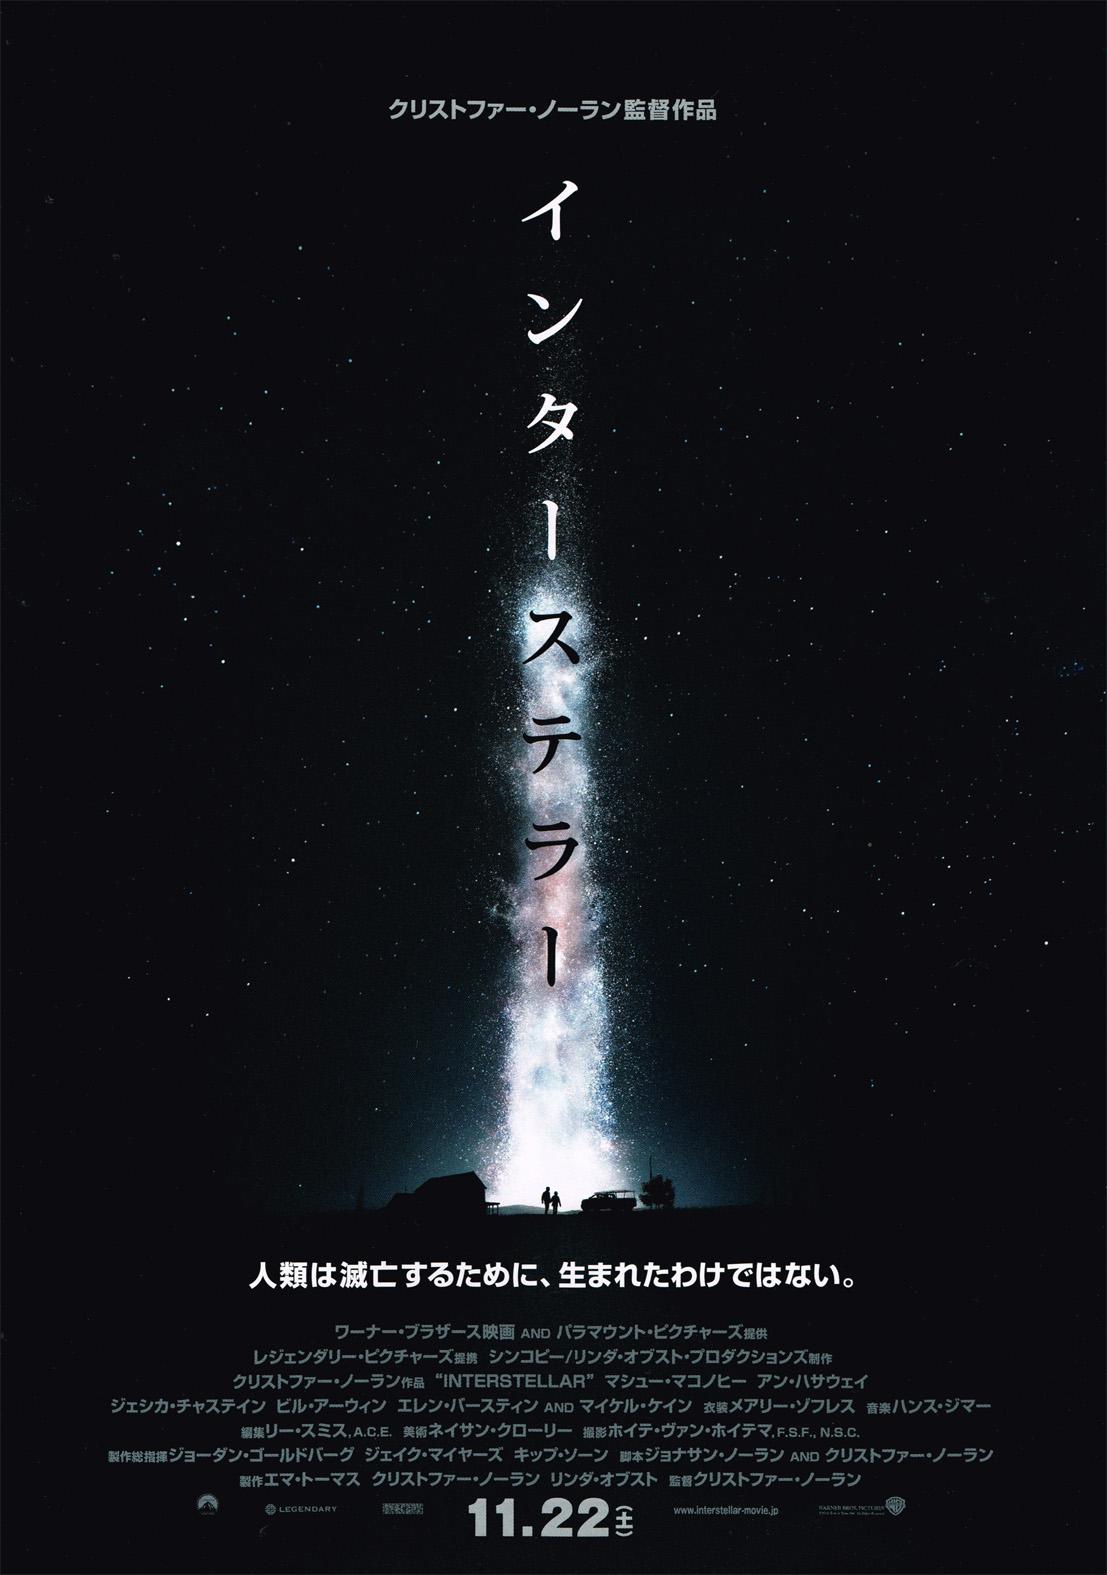 kinopoisk.ru-Interstellar-2462221--o--.j